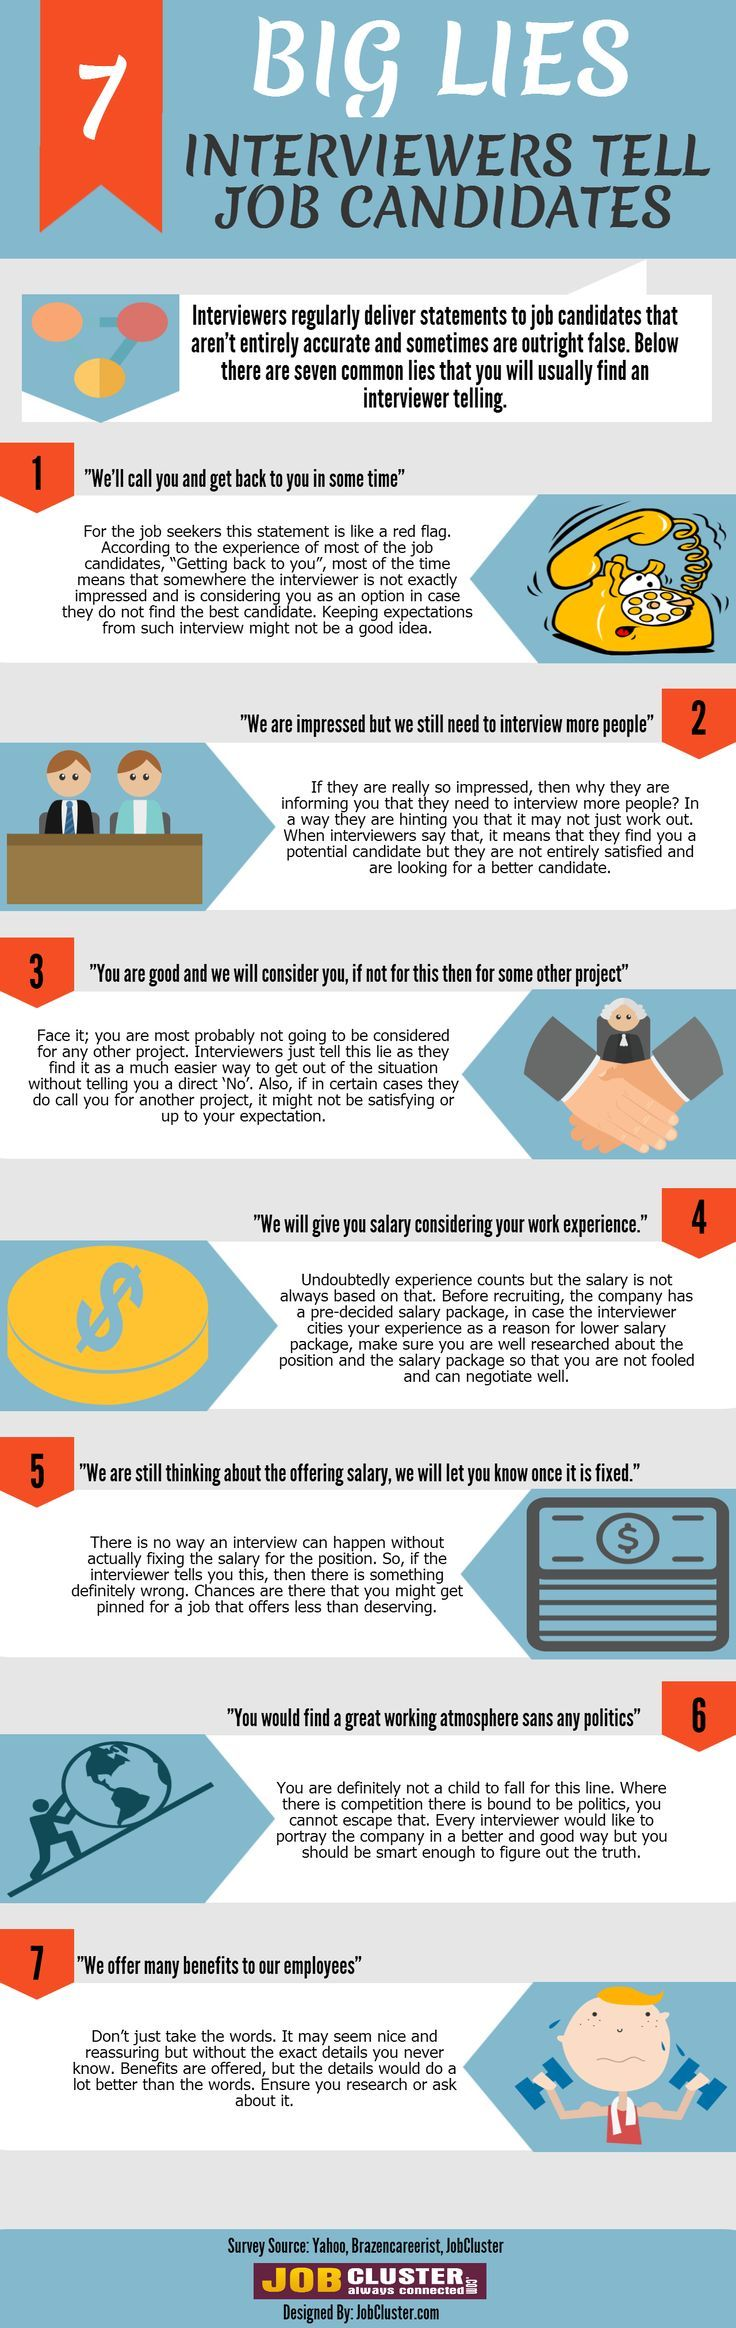 18 best Job interview images on Pinterest | Job interviews, Career ...